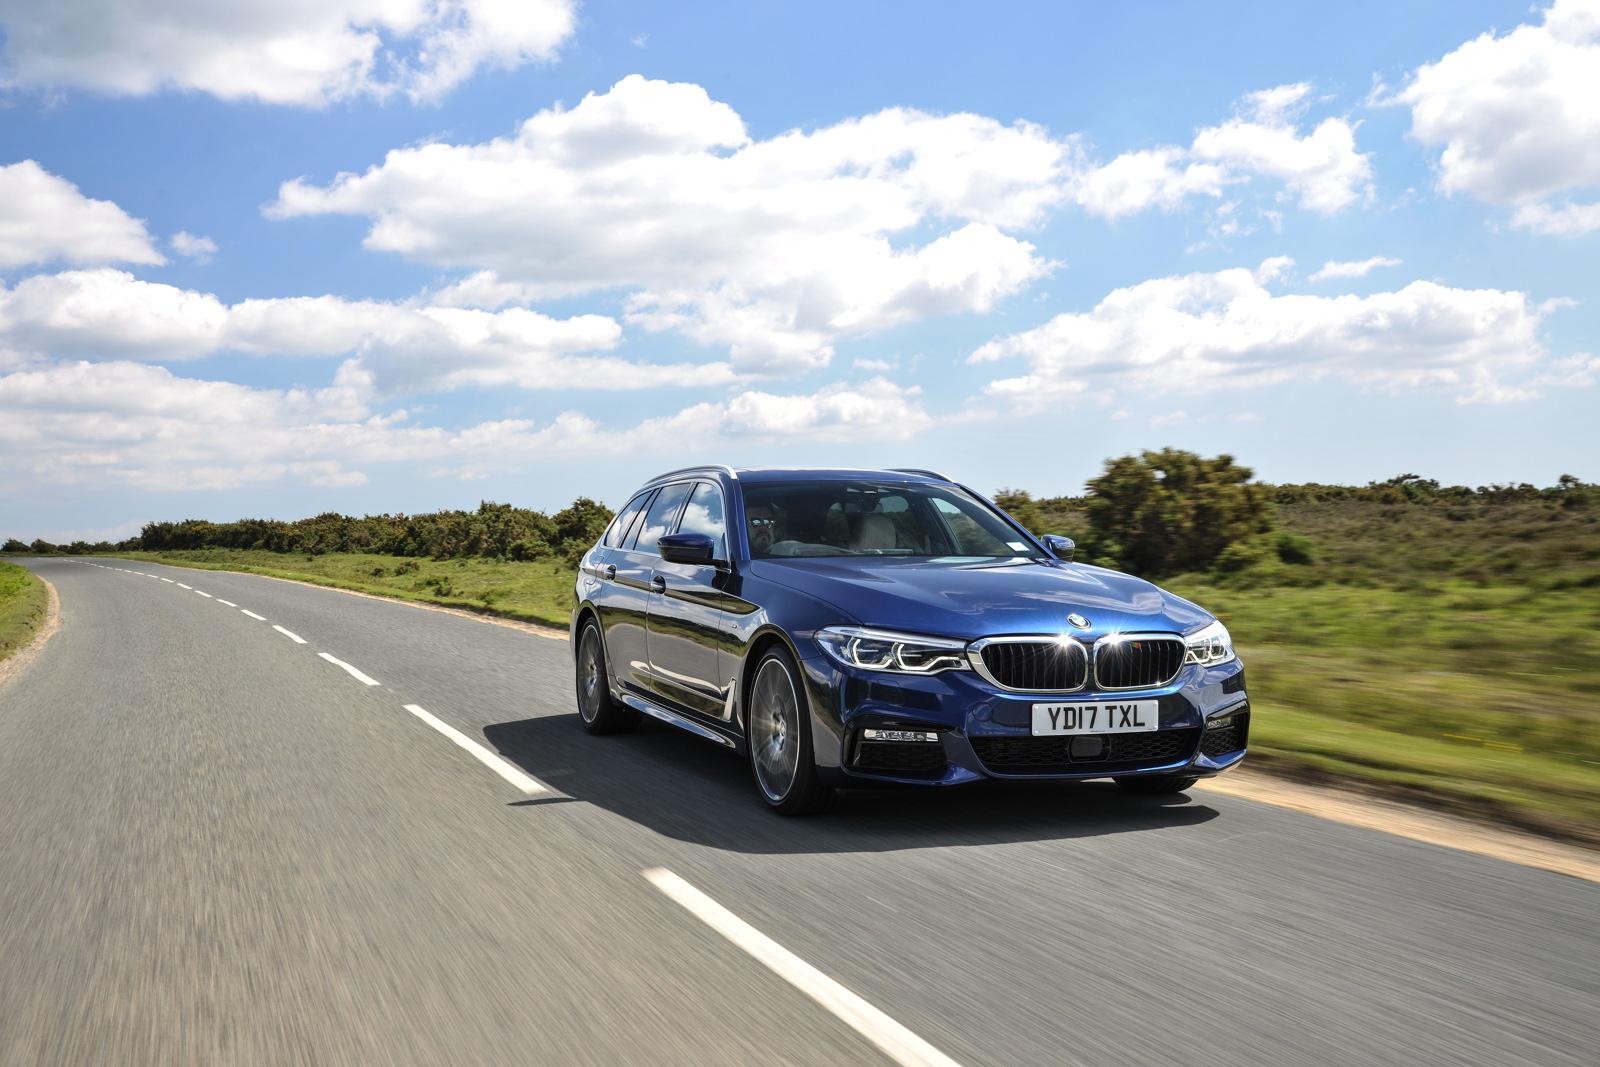 2017 BMW 5 Series Touring England 109